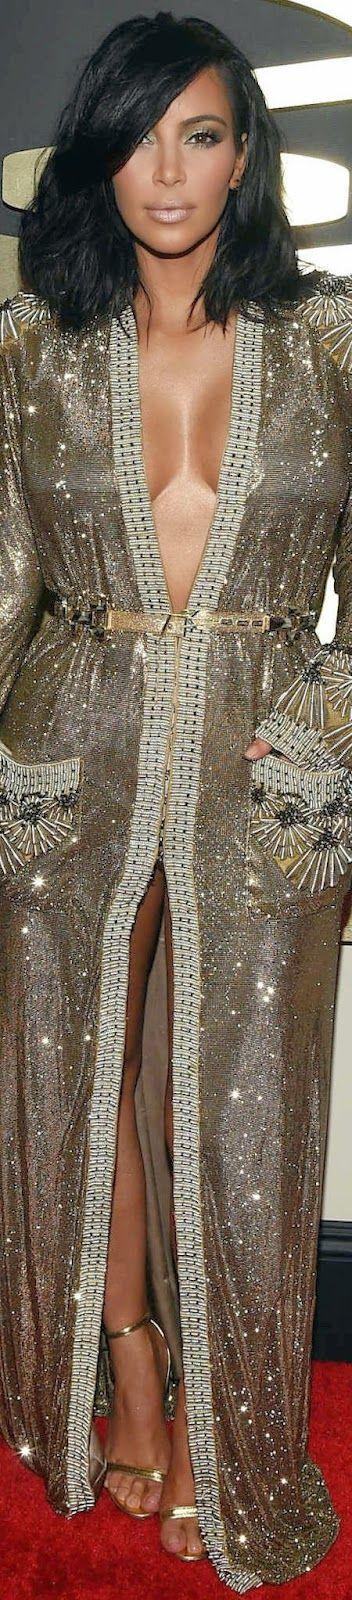 Kim Kardashian in Jean Paul Gaultier \  2015 Grammy Red Carpet Fashion